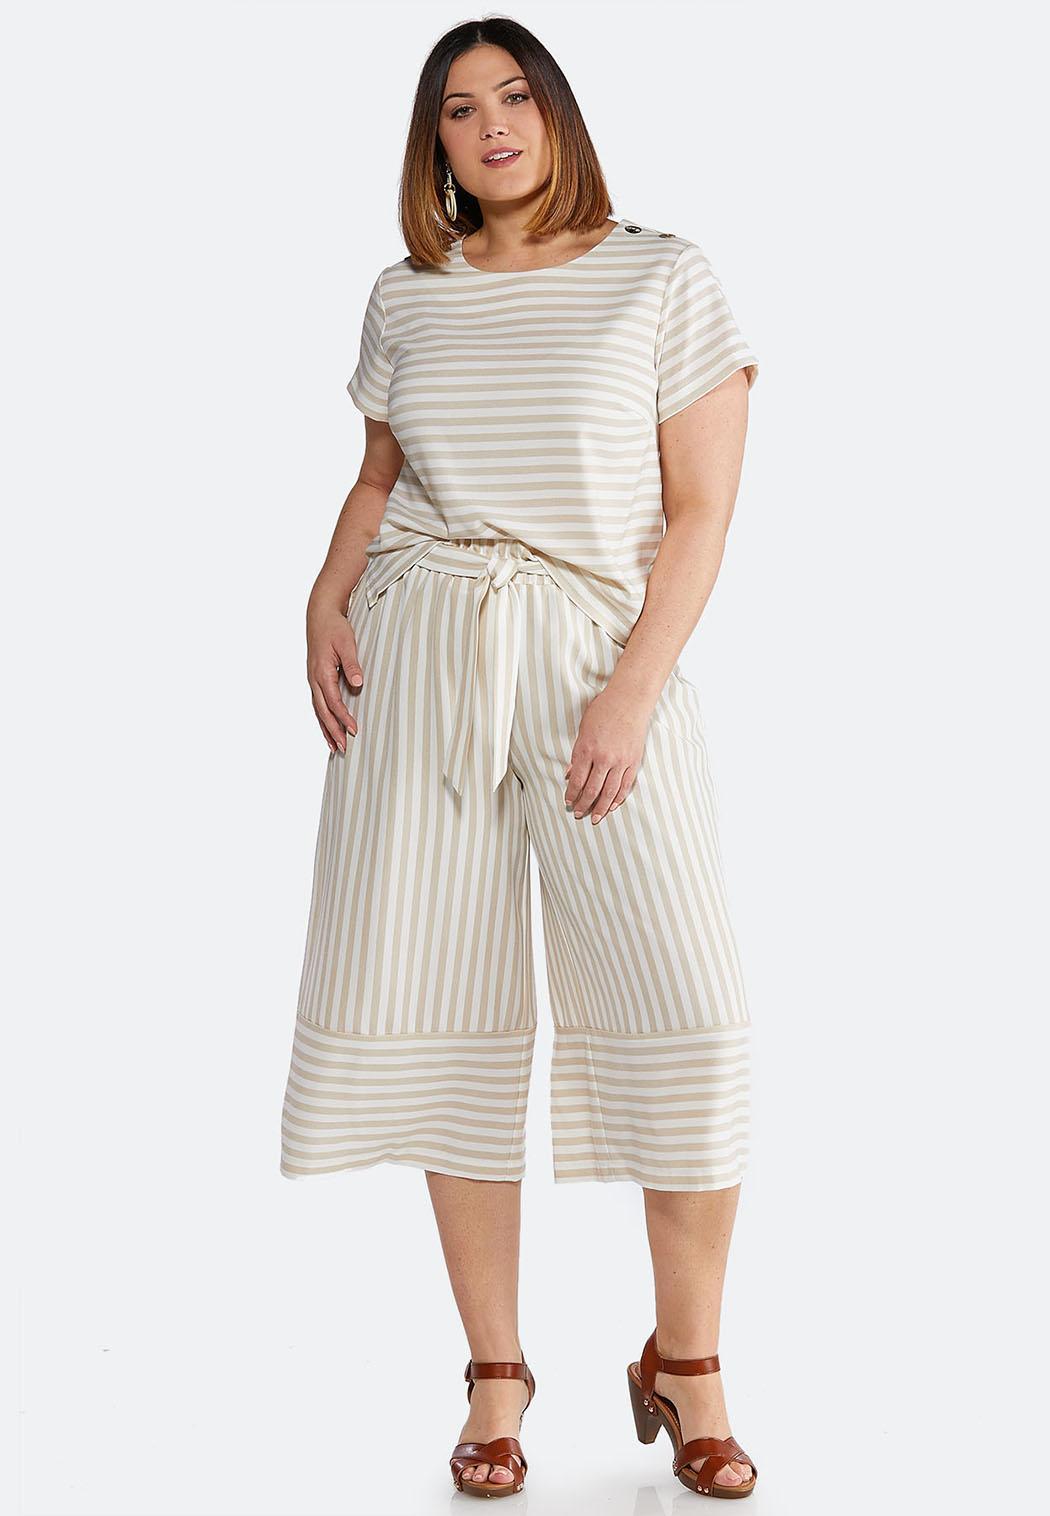 f1b3a4a93da Plus Size Striped Two-Piece Set Plus Sizes Cato Fashions